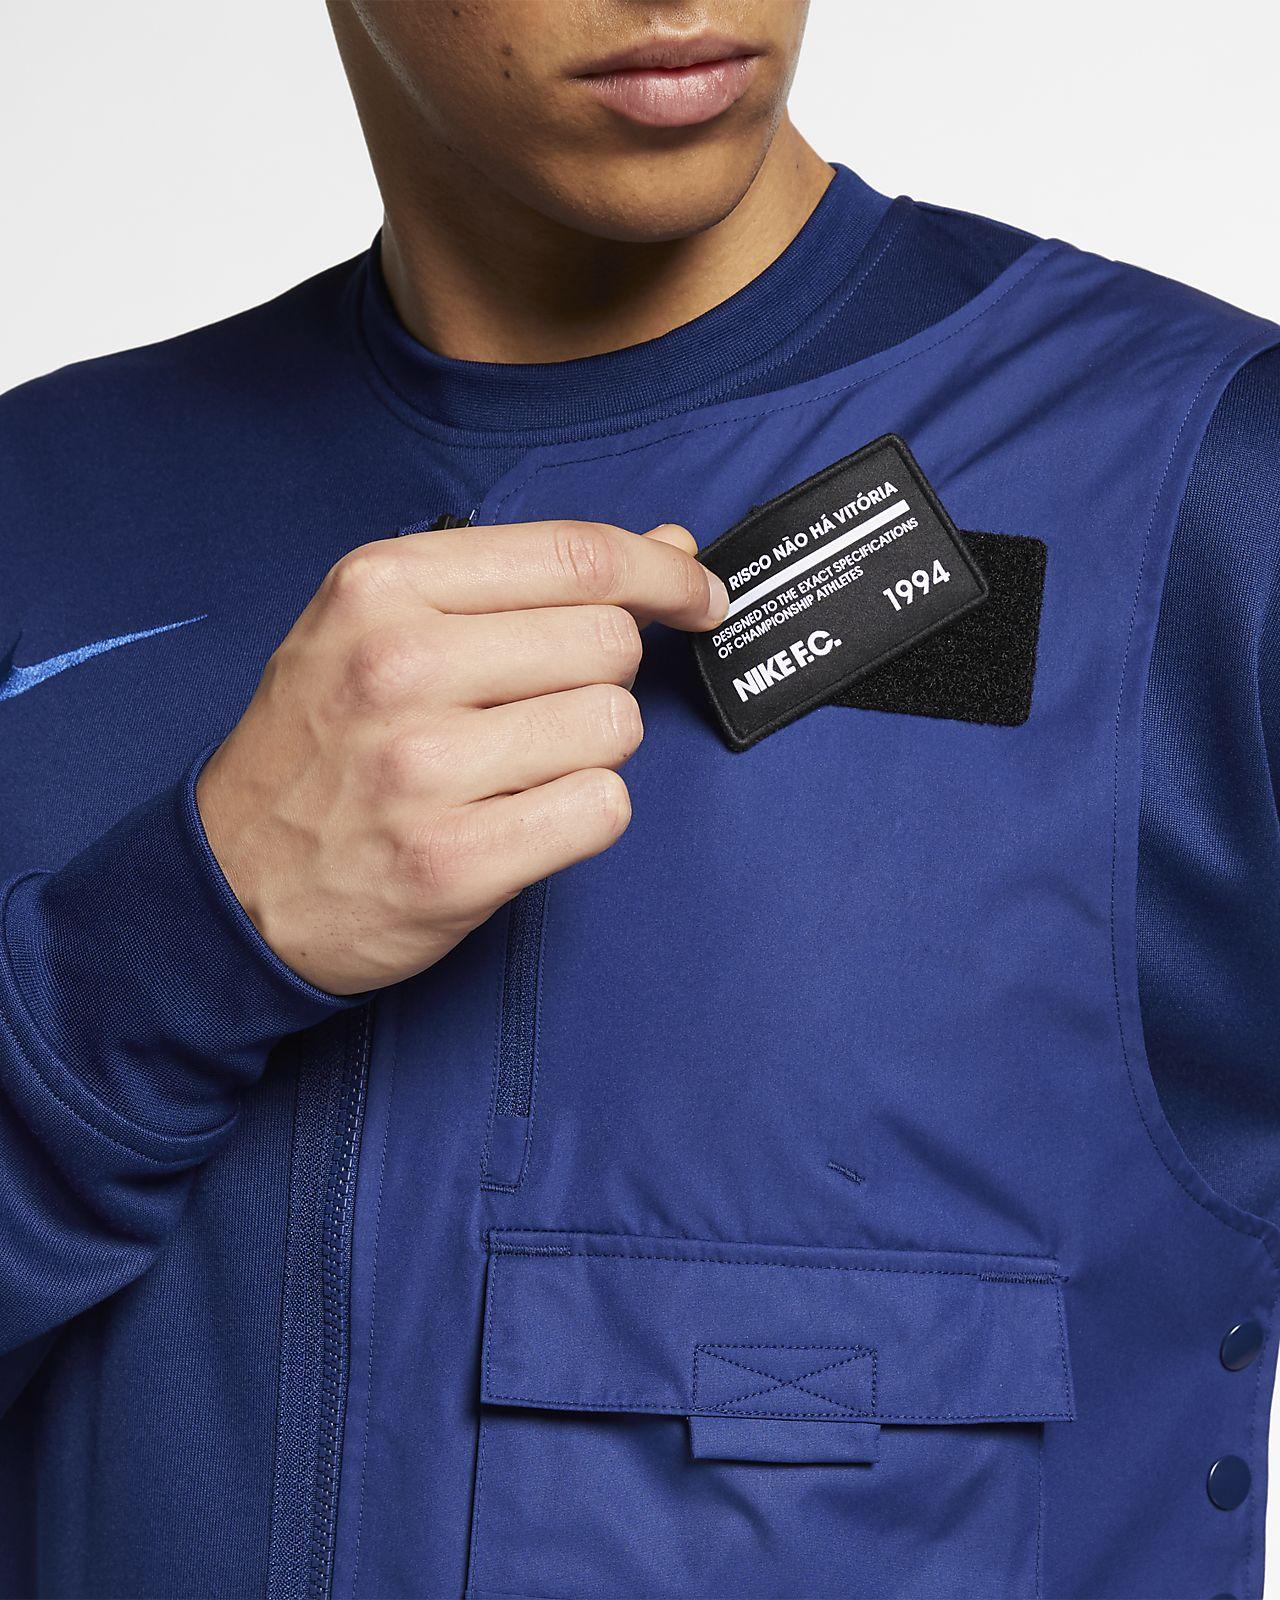 9982c7a4bf90 Low Resolution Ανδρική ποδοσφαιρική μπλούζα Nike F.C. Ανδρική ποδοσφαιρική  μπλούζα Nike F.C.